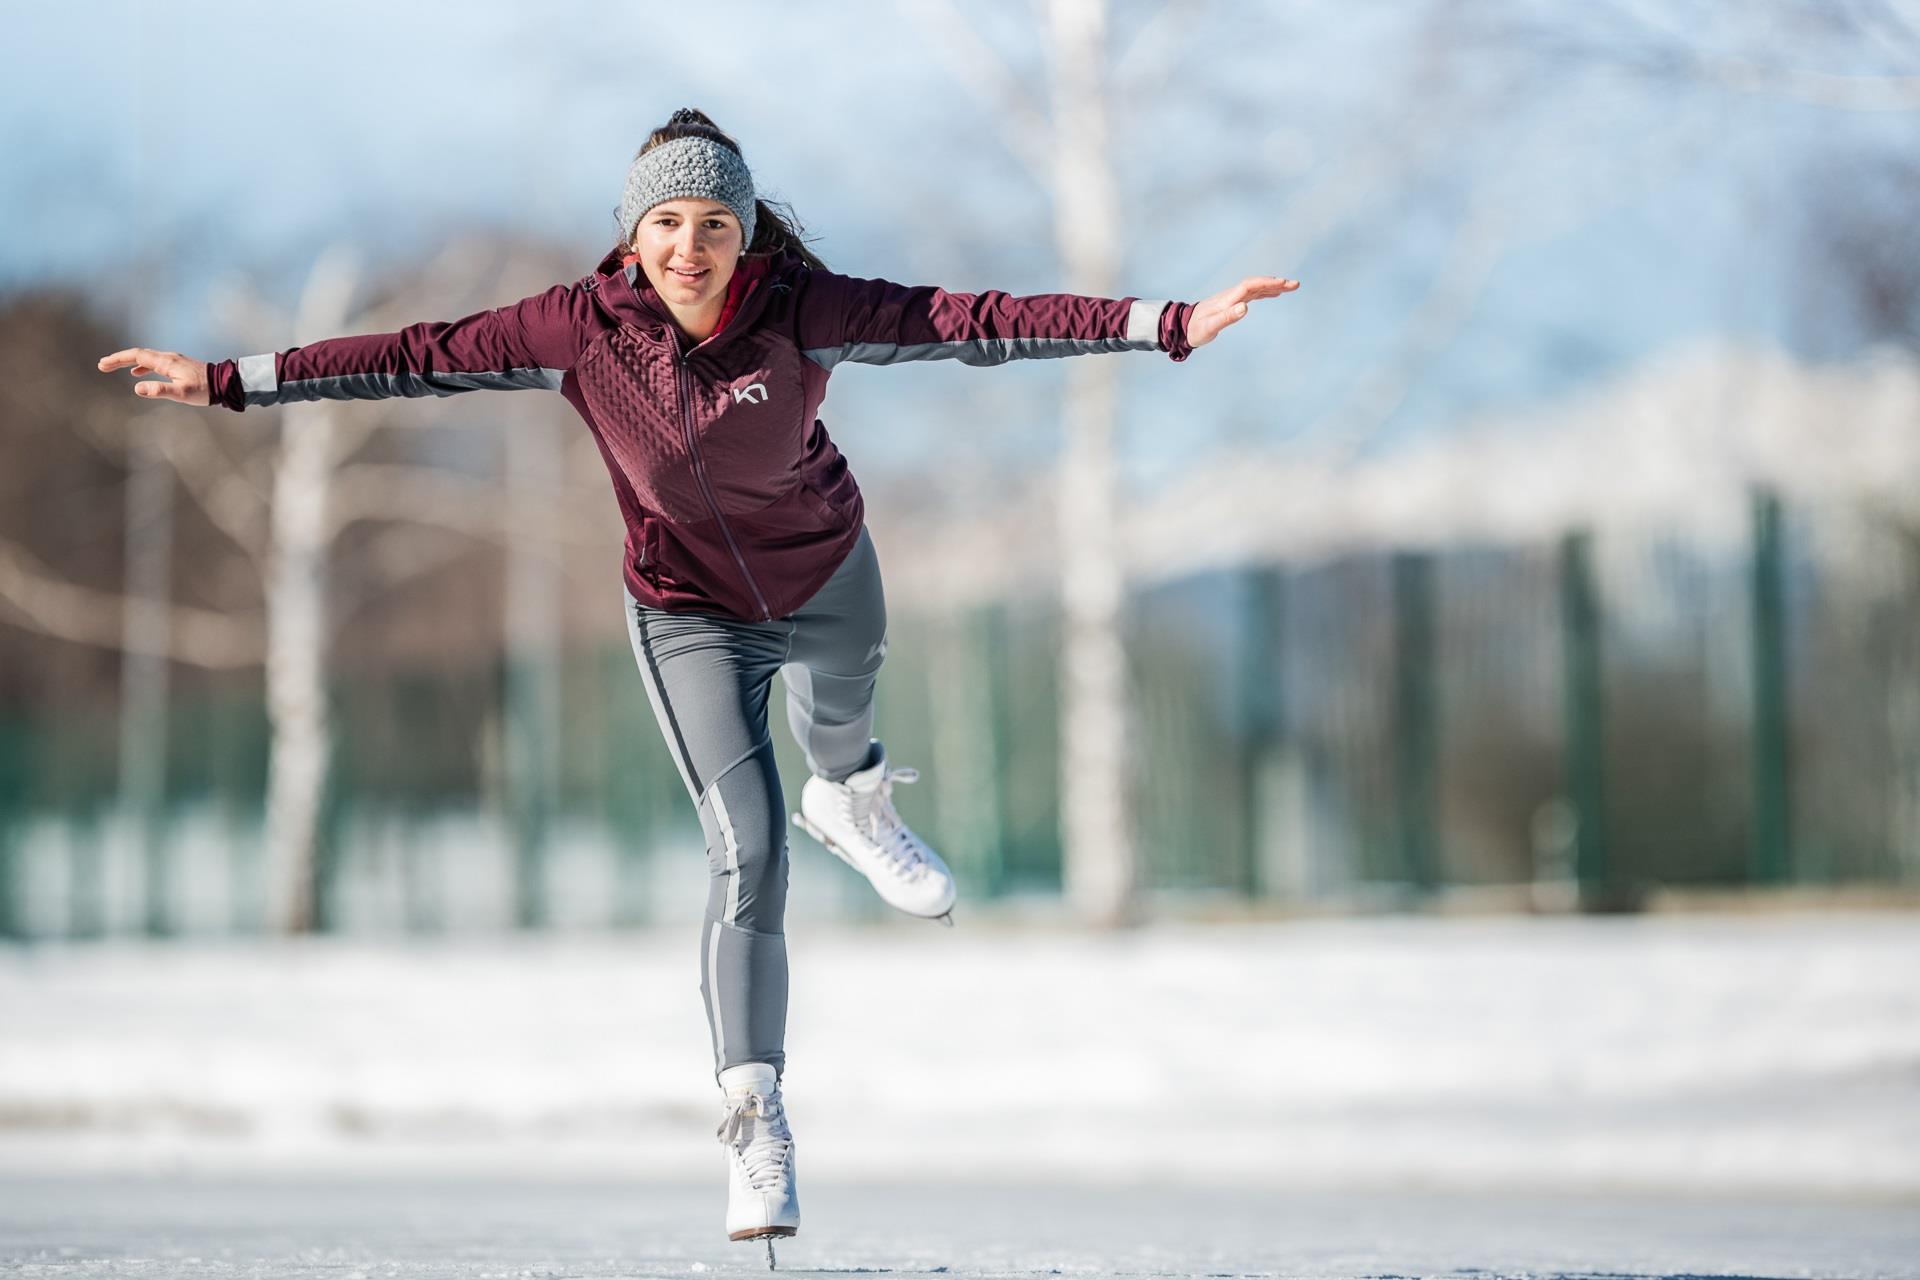 Ice rink Gais